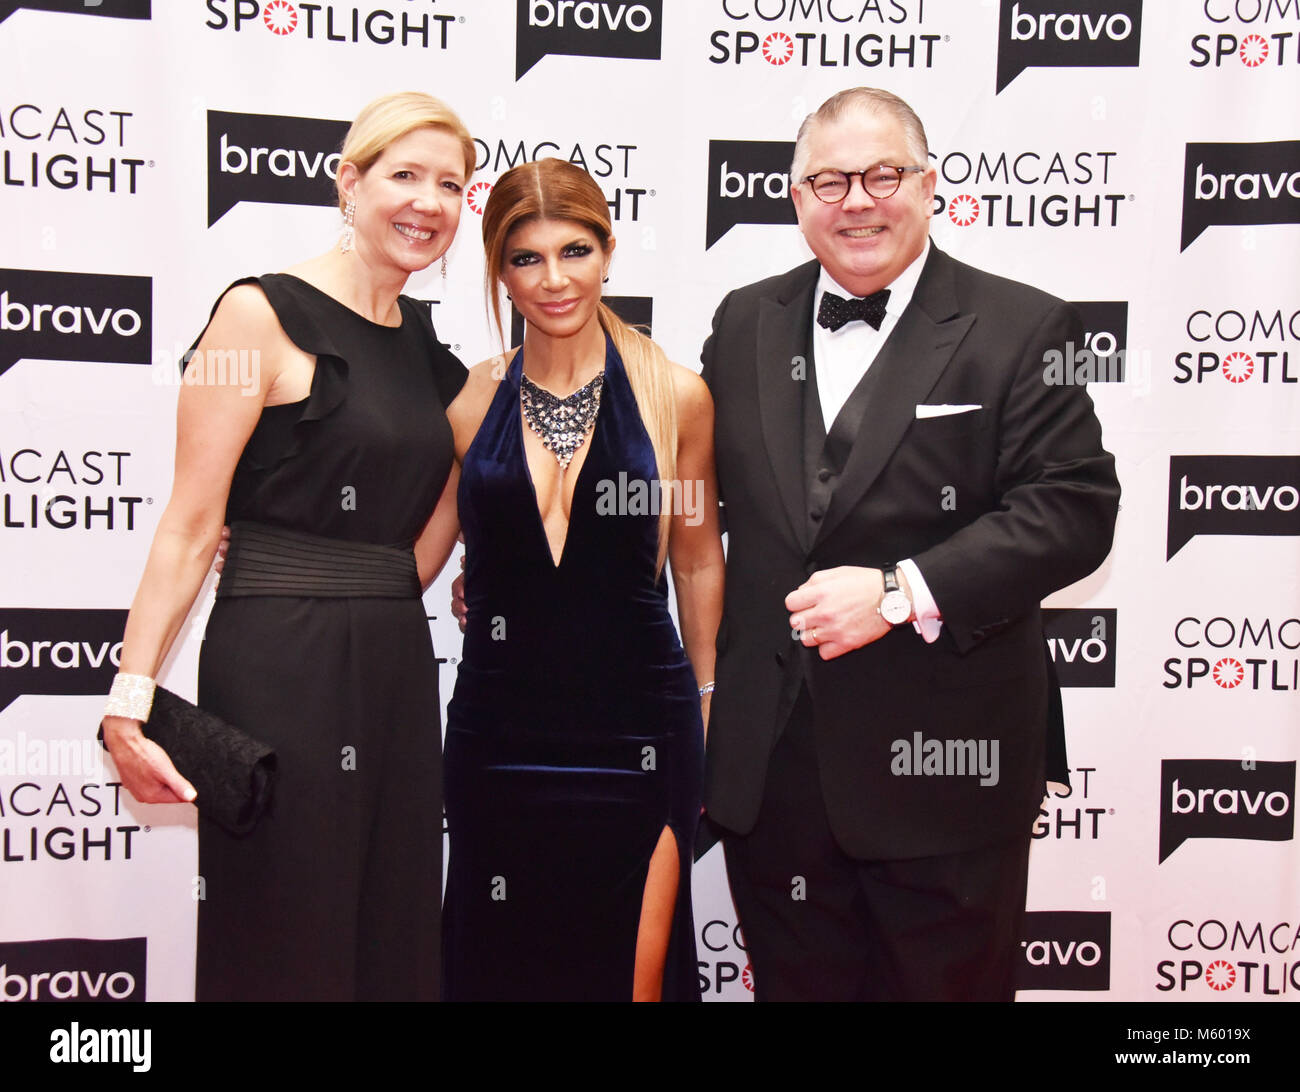 Teresa Giudice Meet & Greet at Philadelphia Auto Show sponsored by